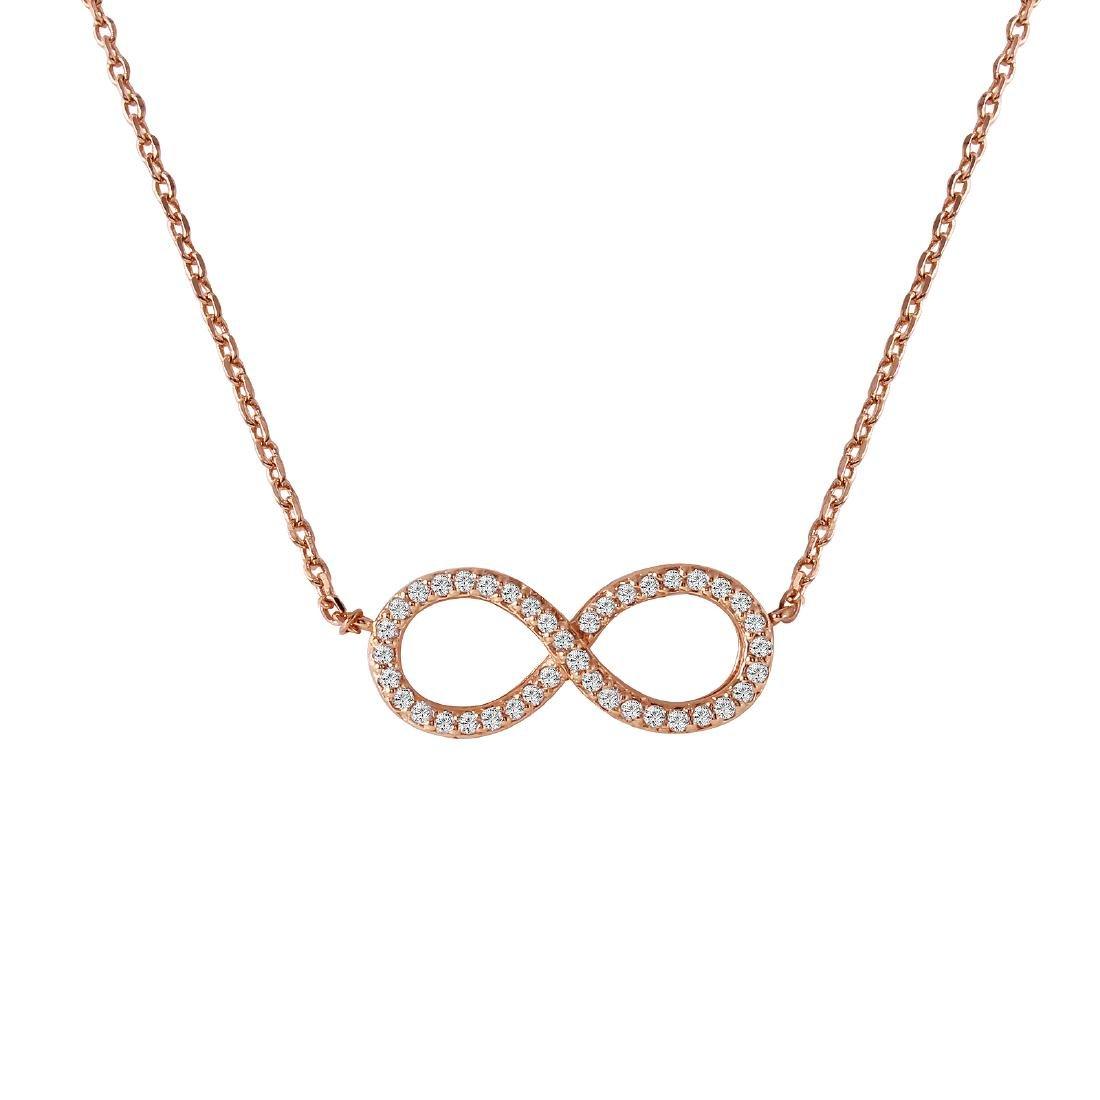 0.18 Carat Natural Diamond 18K Solid Rose Gold Necklace